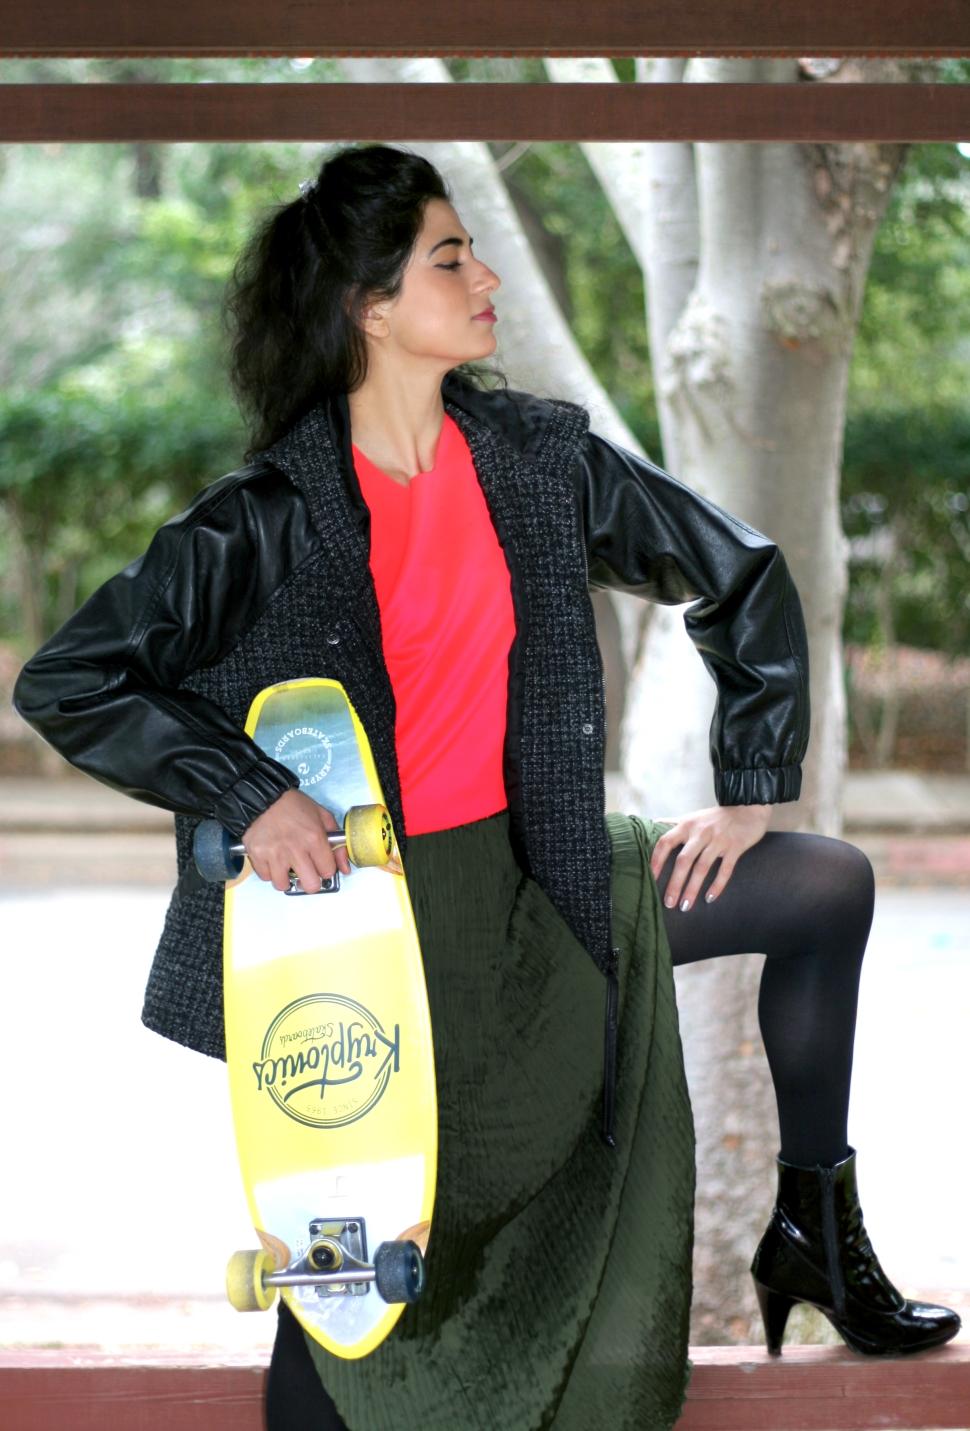 San Francisco Blogger, San Francisco Style, Blogger, Skater Look, Skater Girl, Fashionista, Street Style, Fashion Blogger,